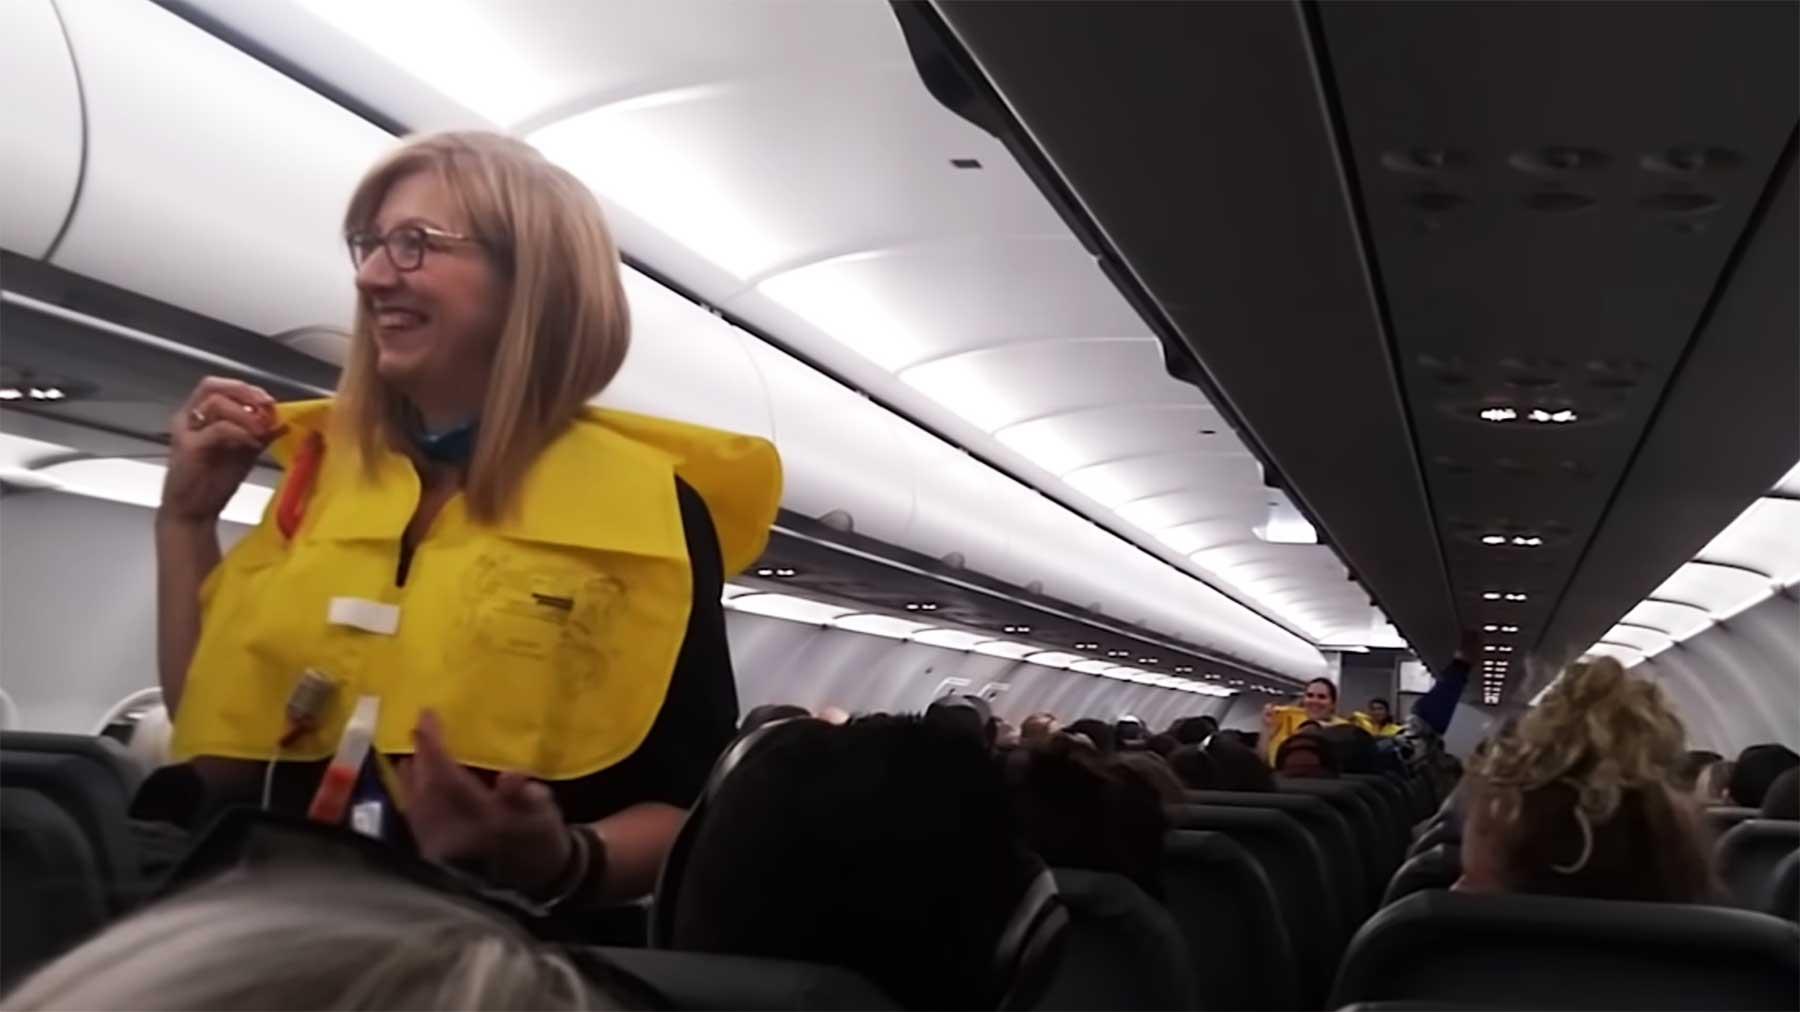 Lustige Flugsicherheits-Ansage lustige-flugdurchsage